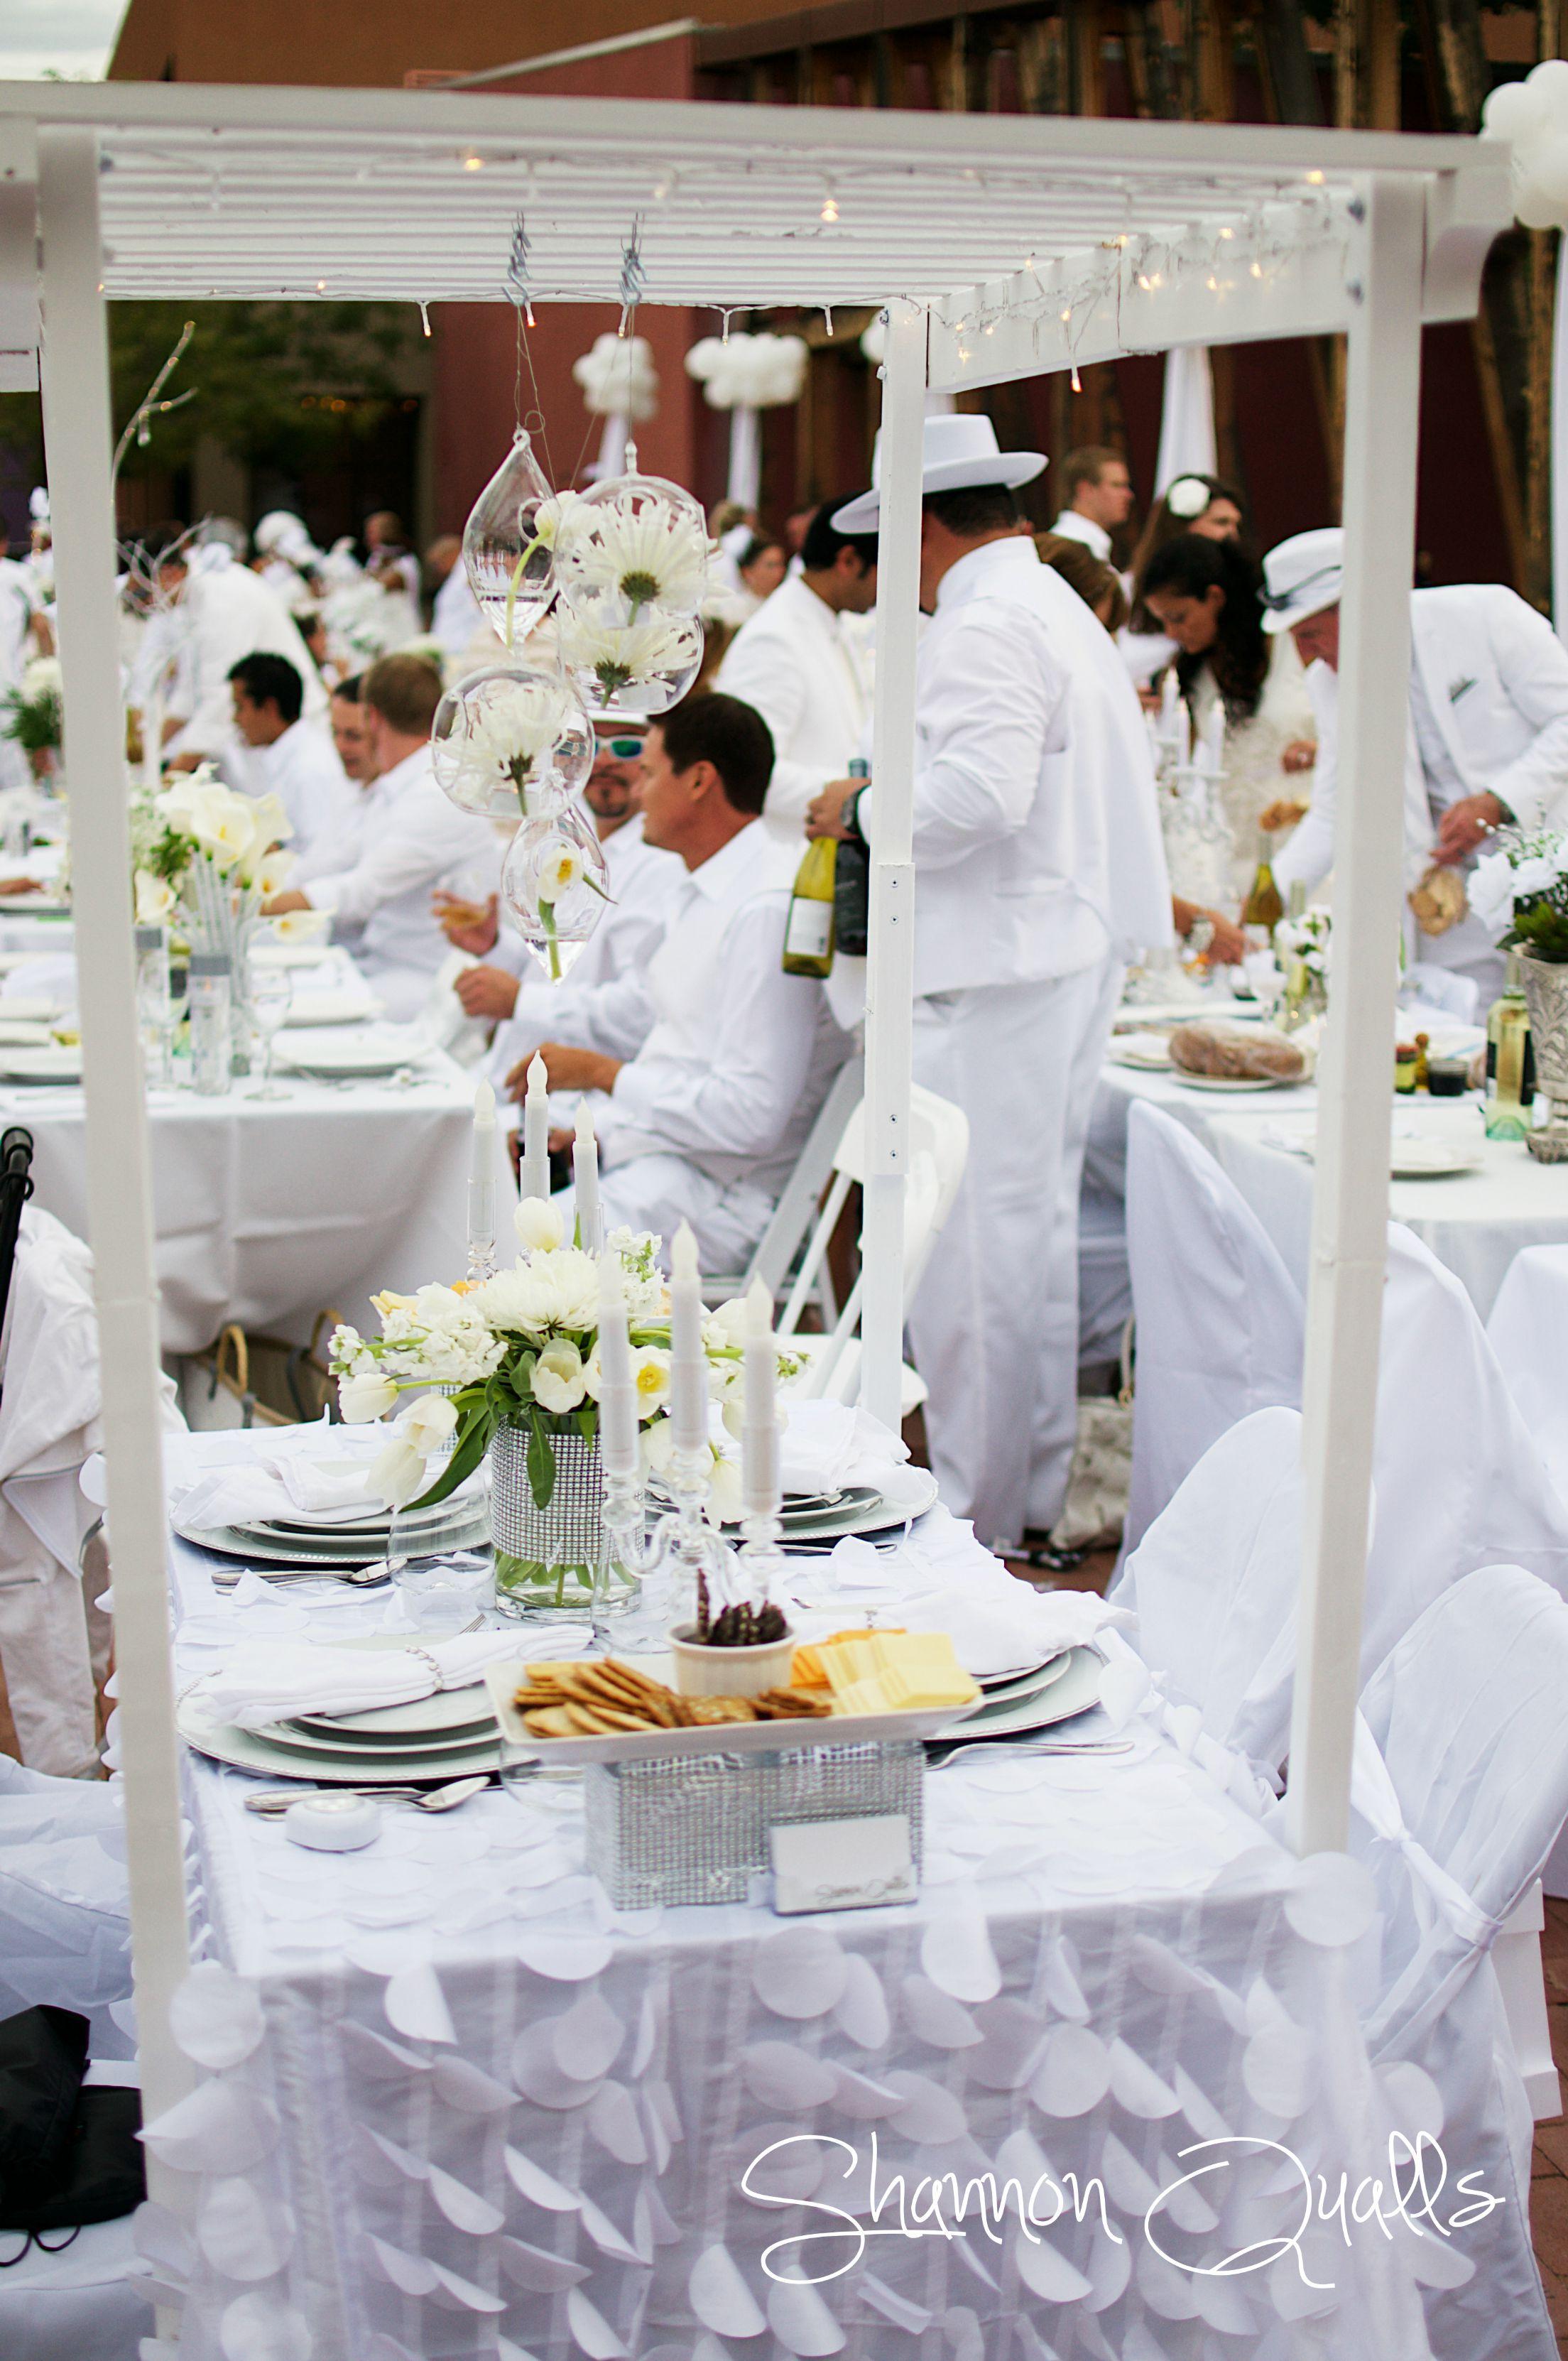 Diner En Blanc Tabletop From Shannonqualls Com In 2019